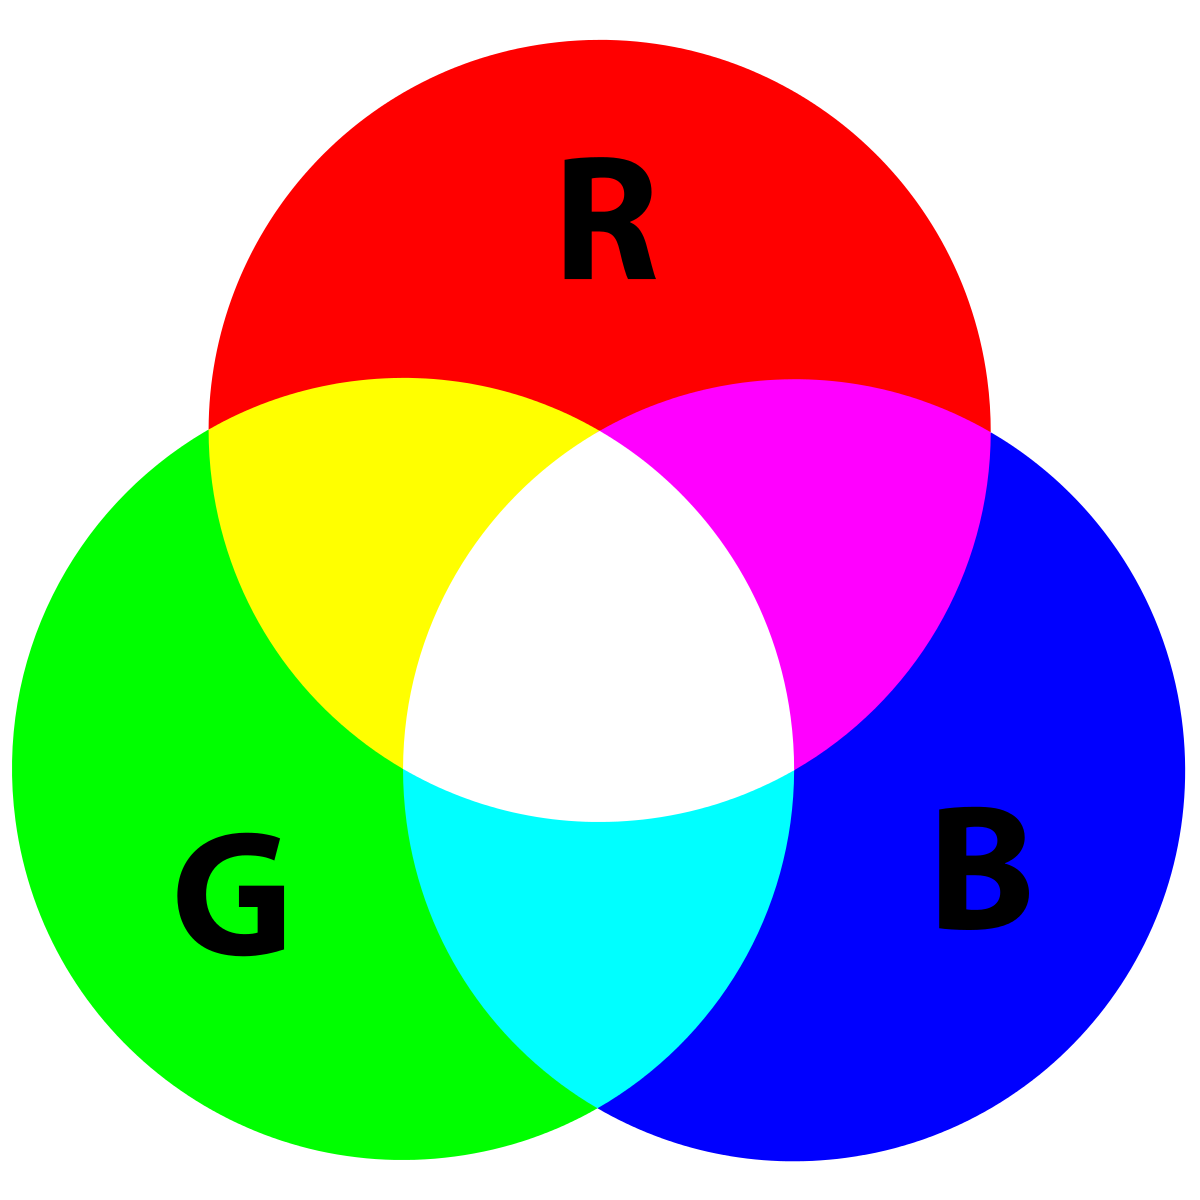 Mixing colors explore pictures. Crayon clipart coloured crayon